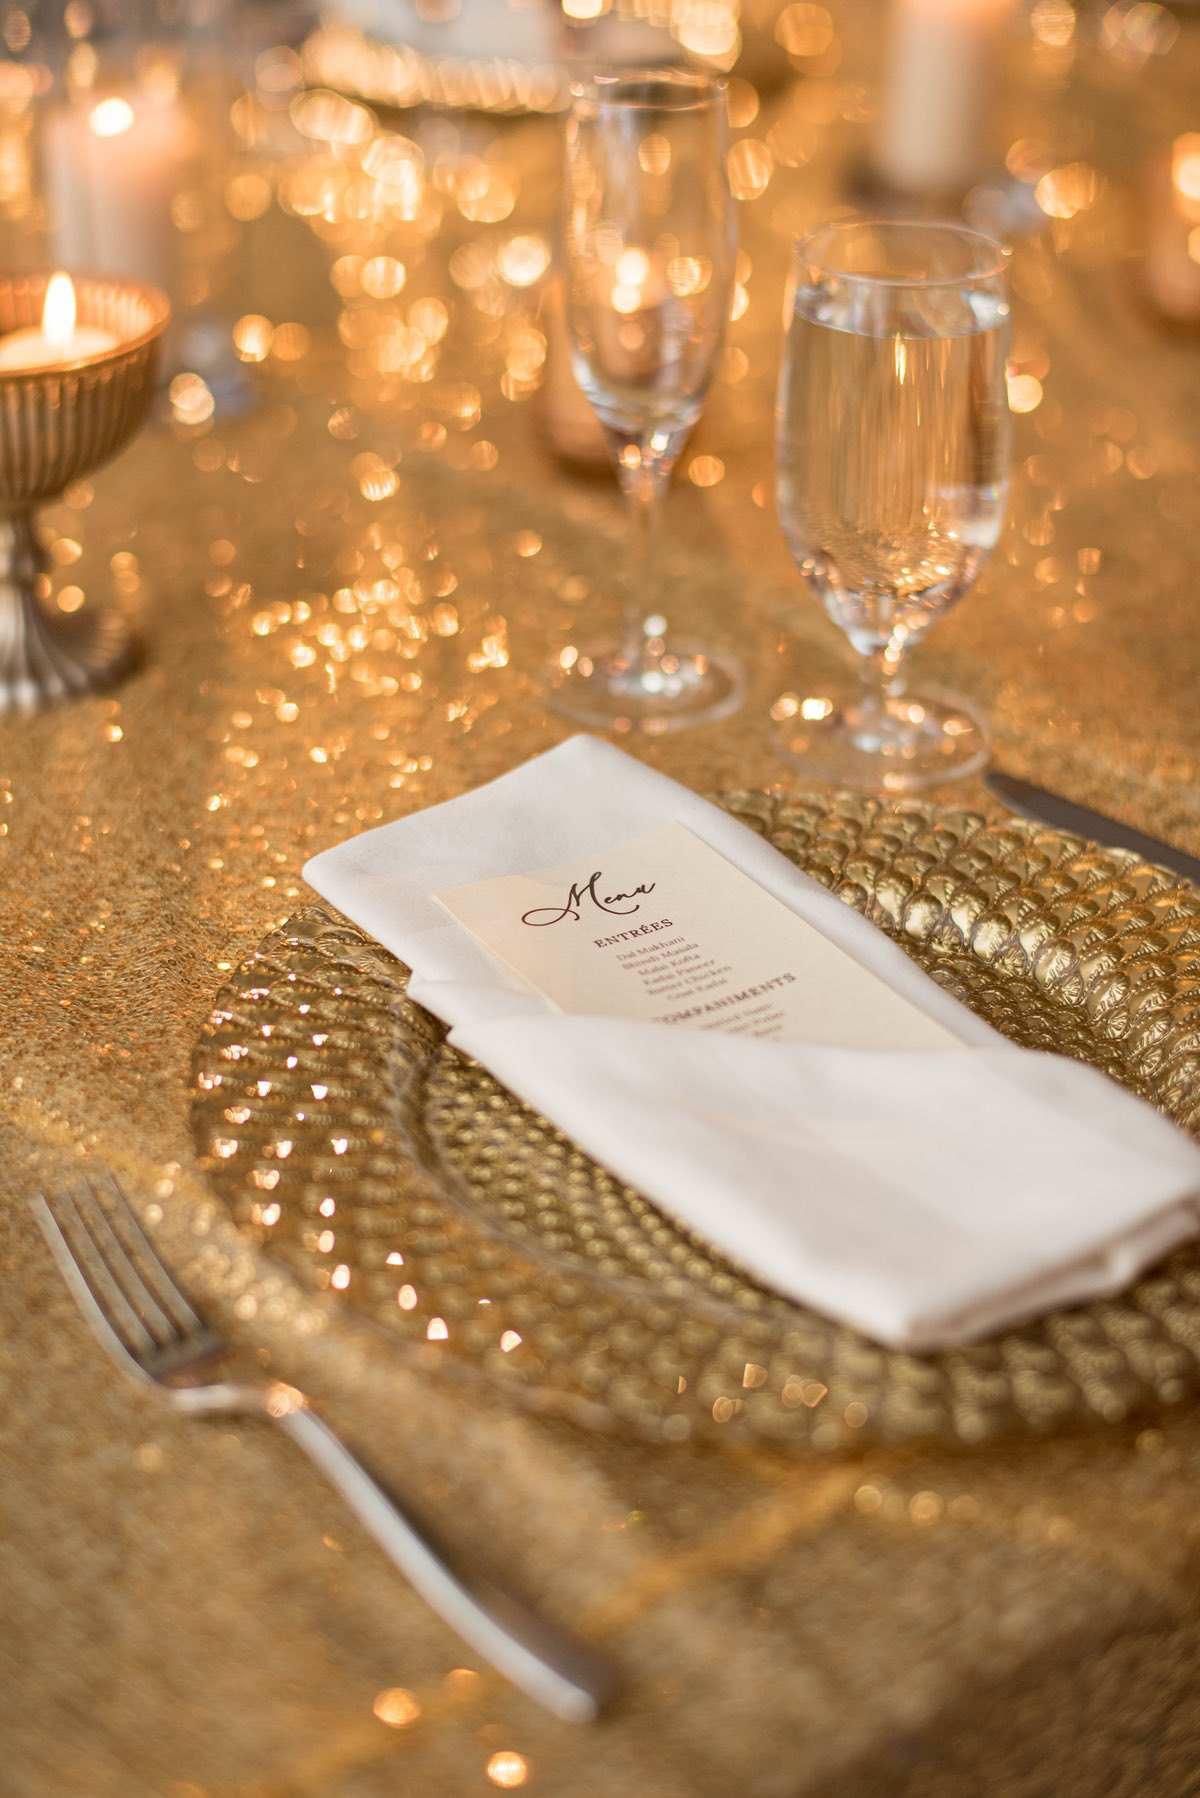 Le_Cape_Weddings_-_Serena_-_Chicago_South_Asian_Wedding-182.jpg